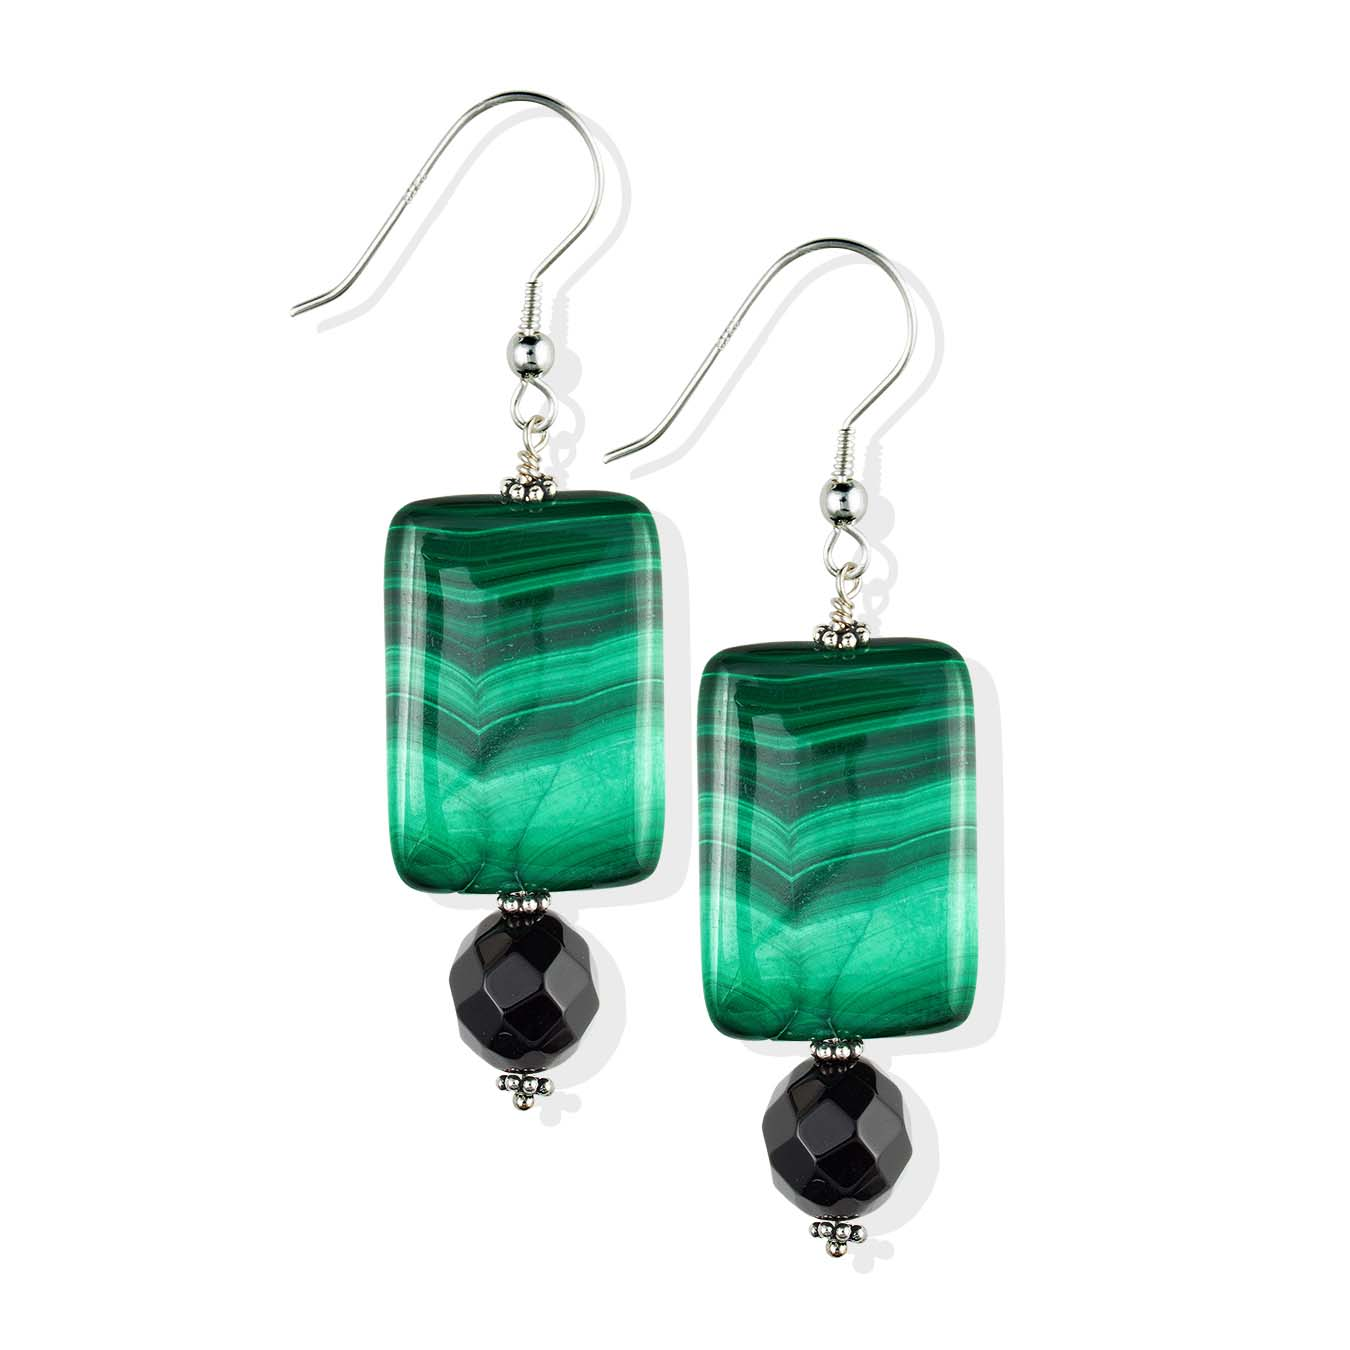 Customizable choker necklace using black agate and green malachite